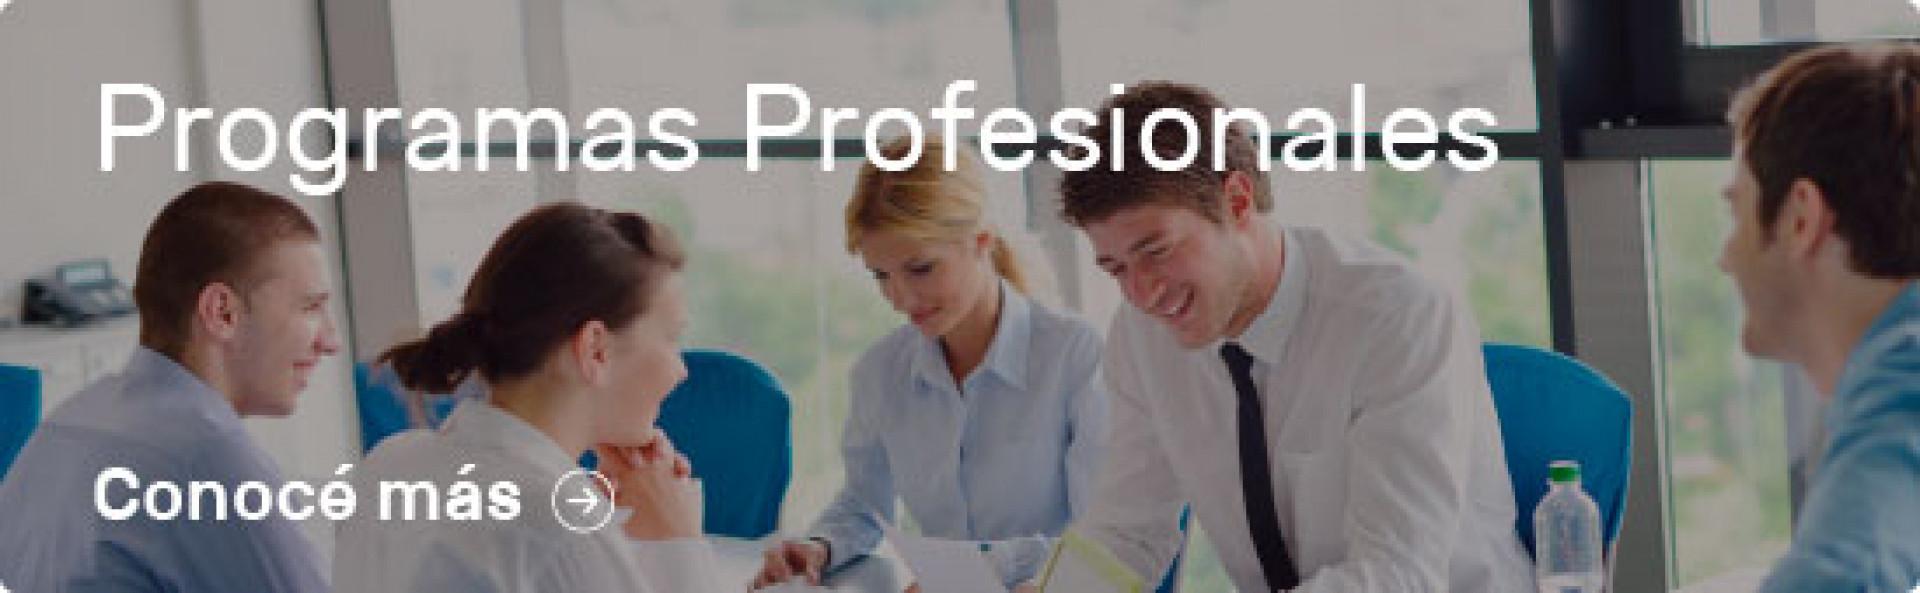 Programas Profesionales